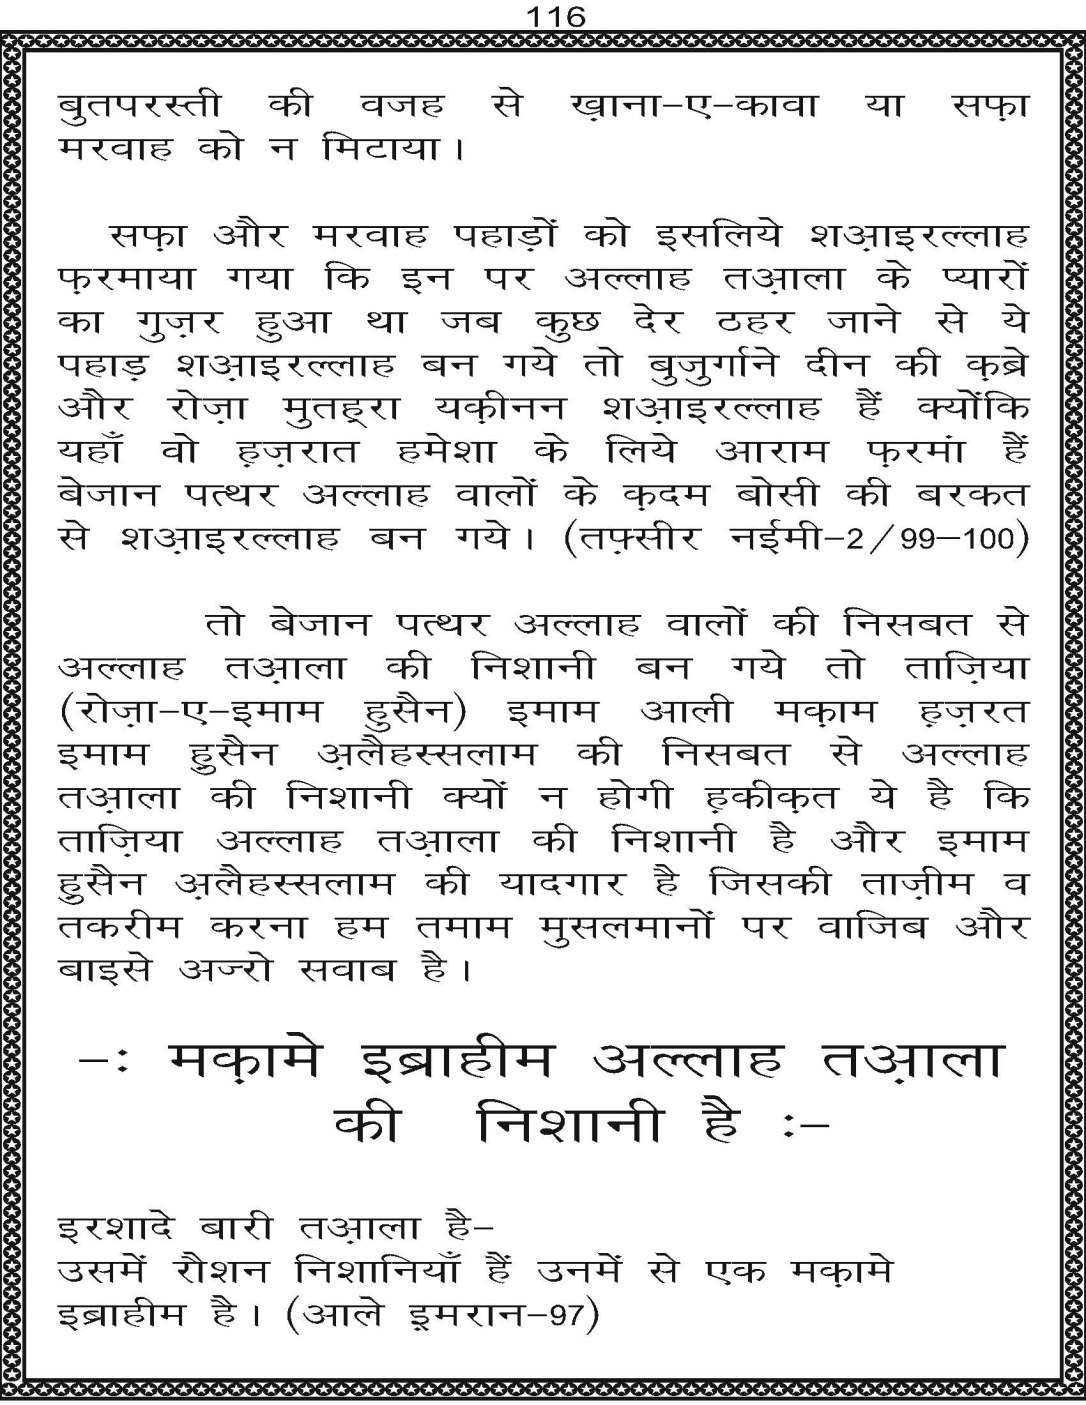 AzmateTaziyadari_Page_116